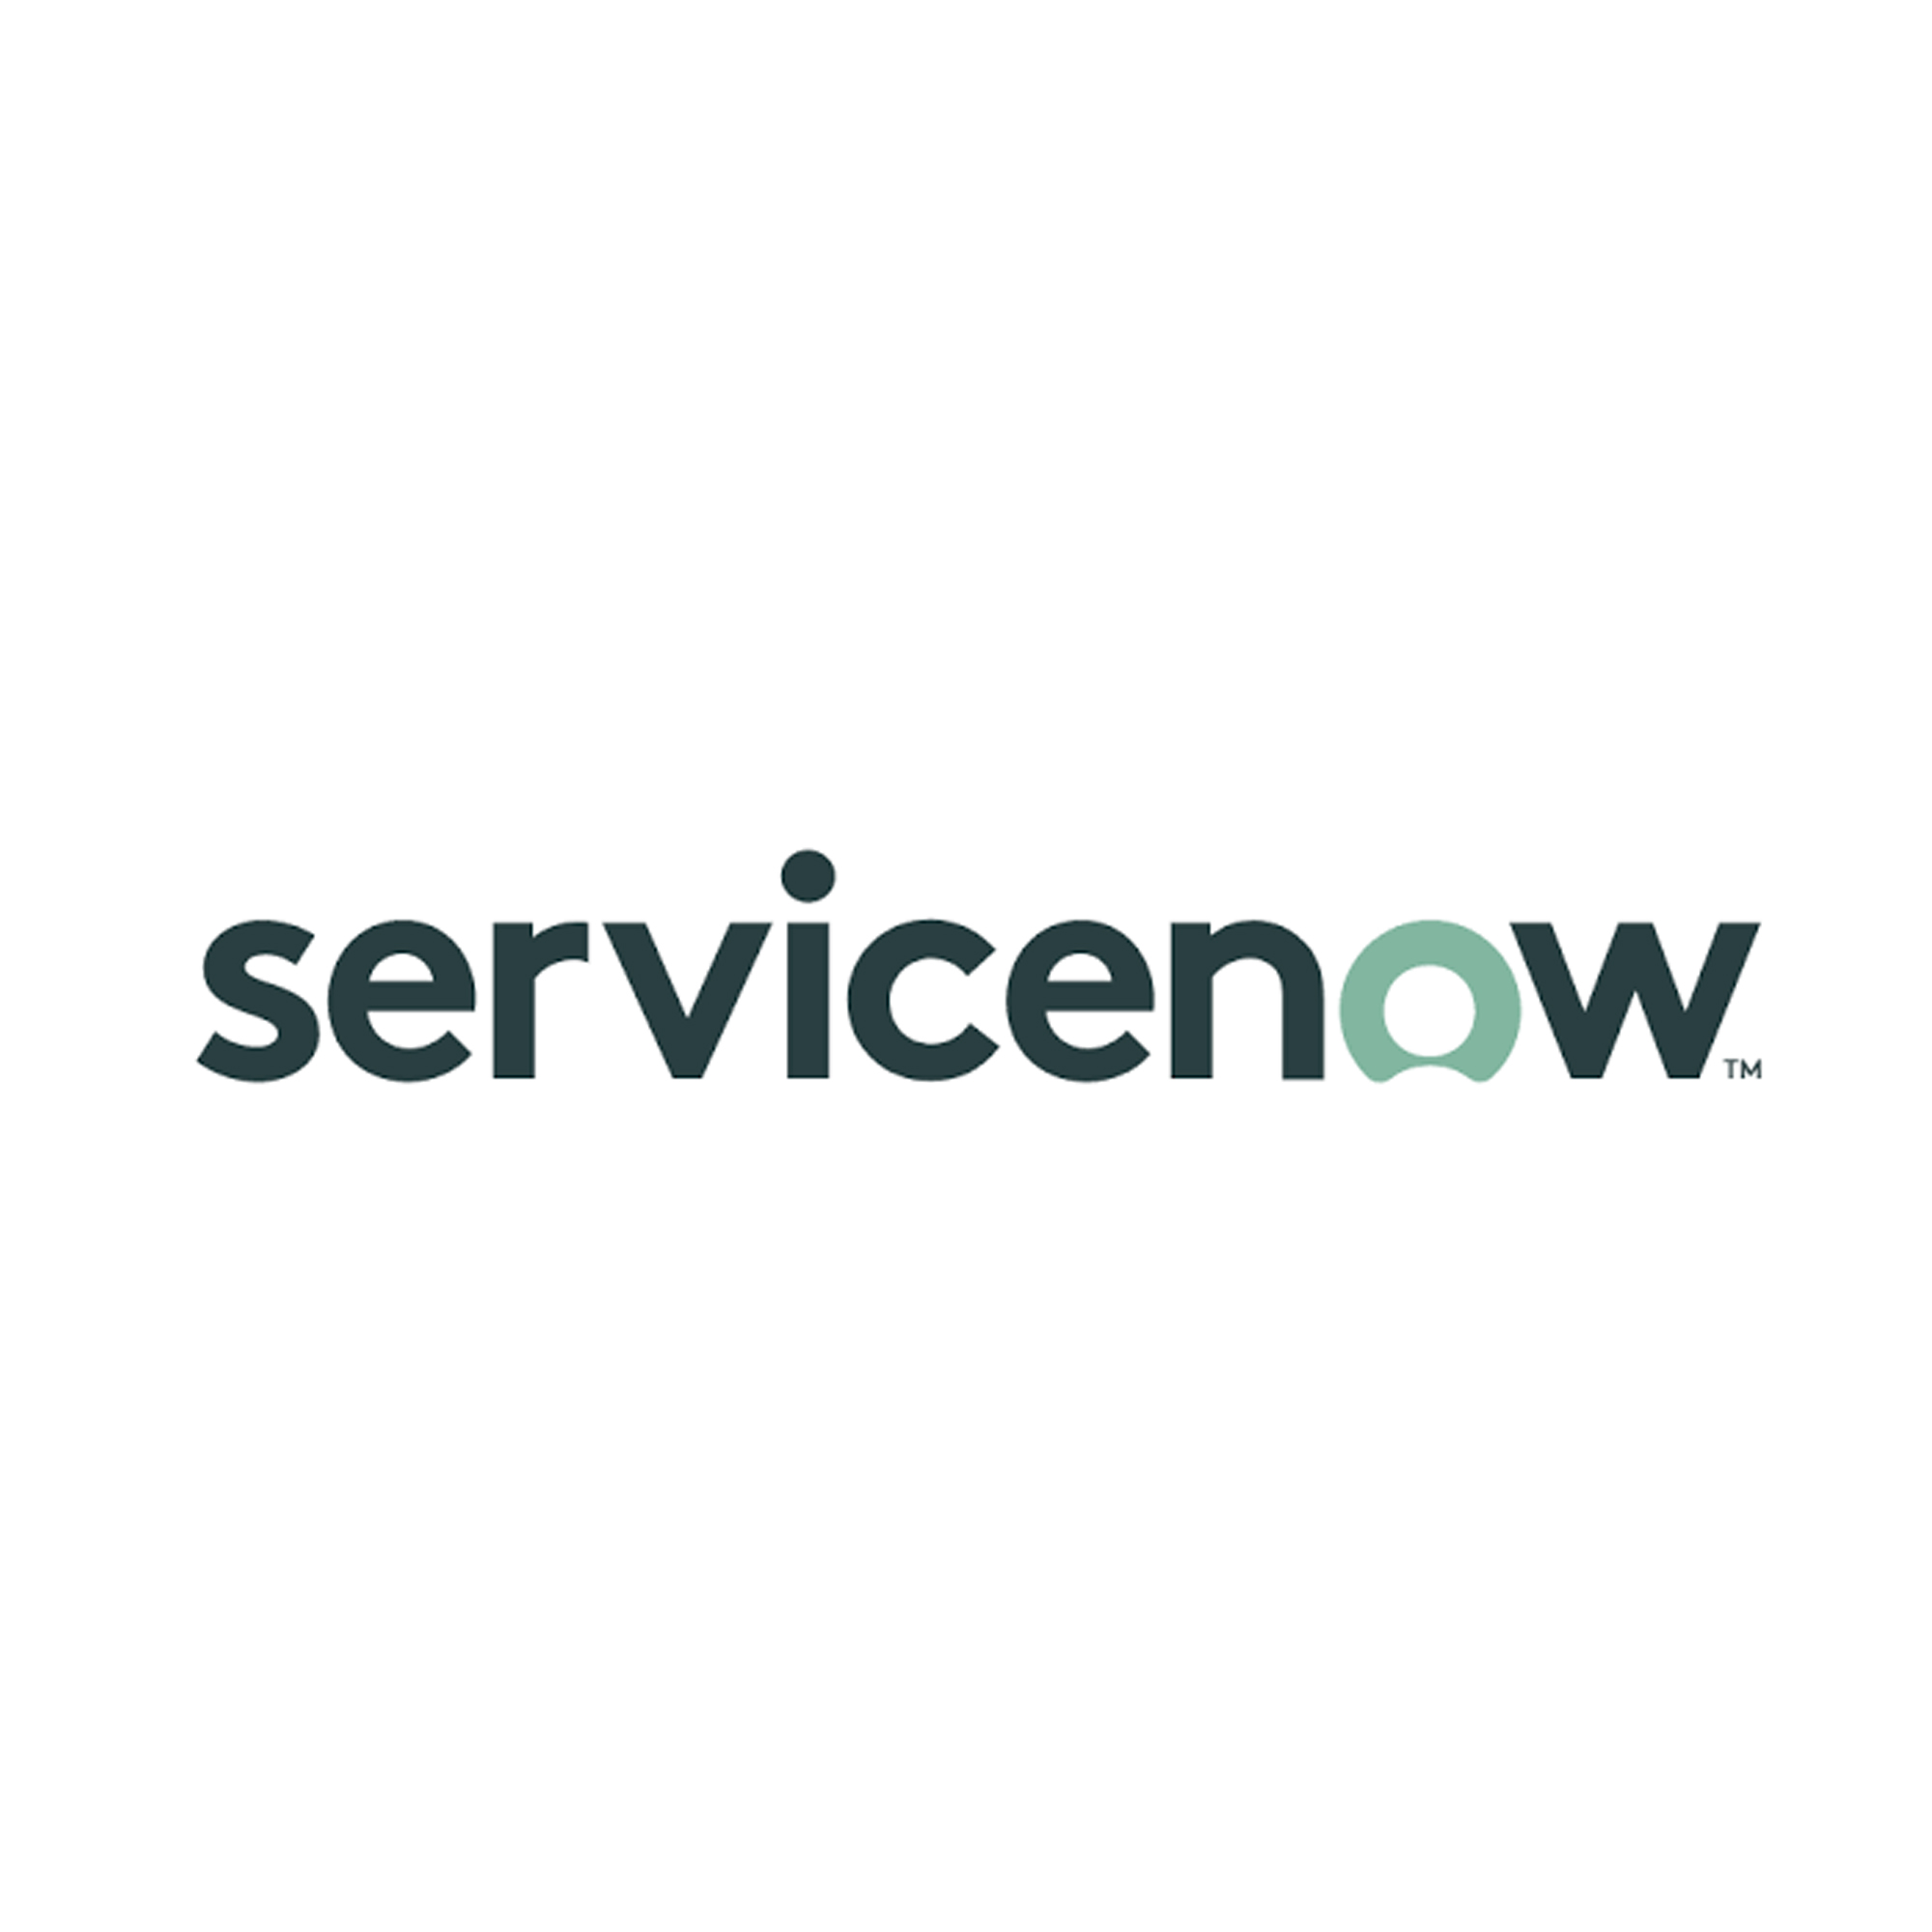 Logo-ServiceNow.jpg